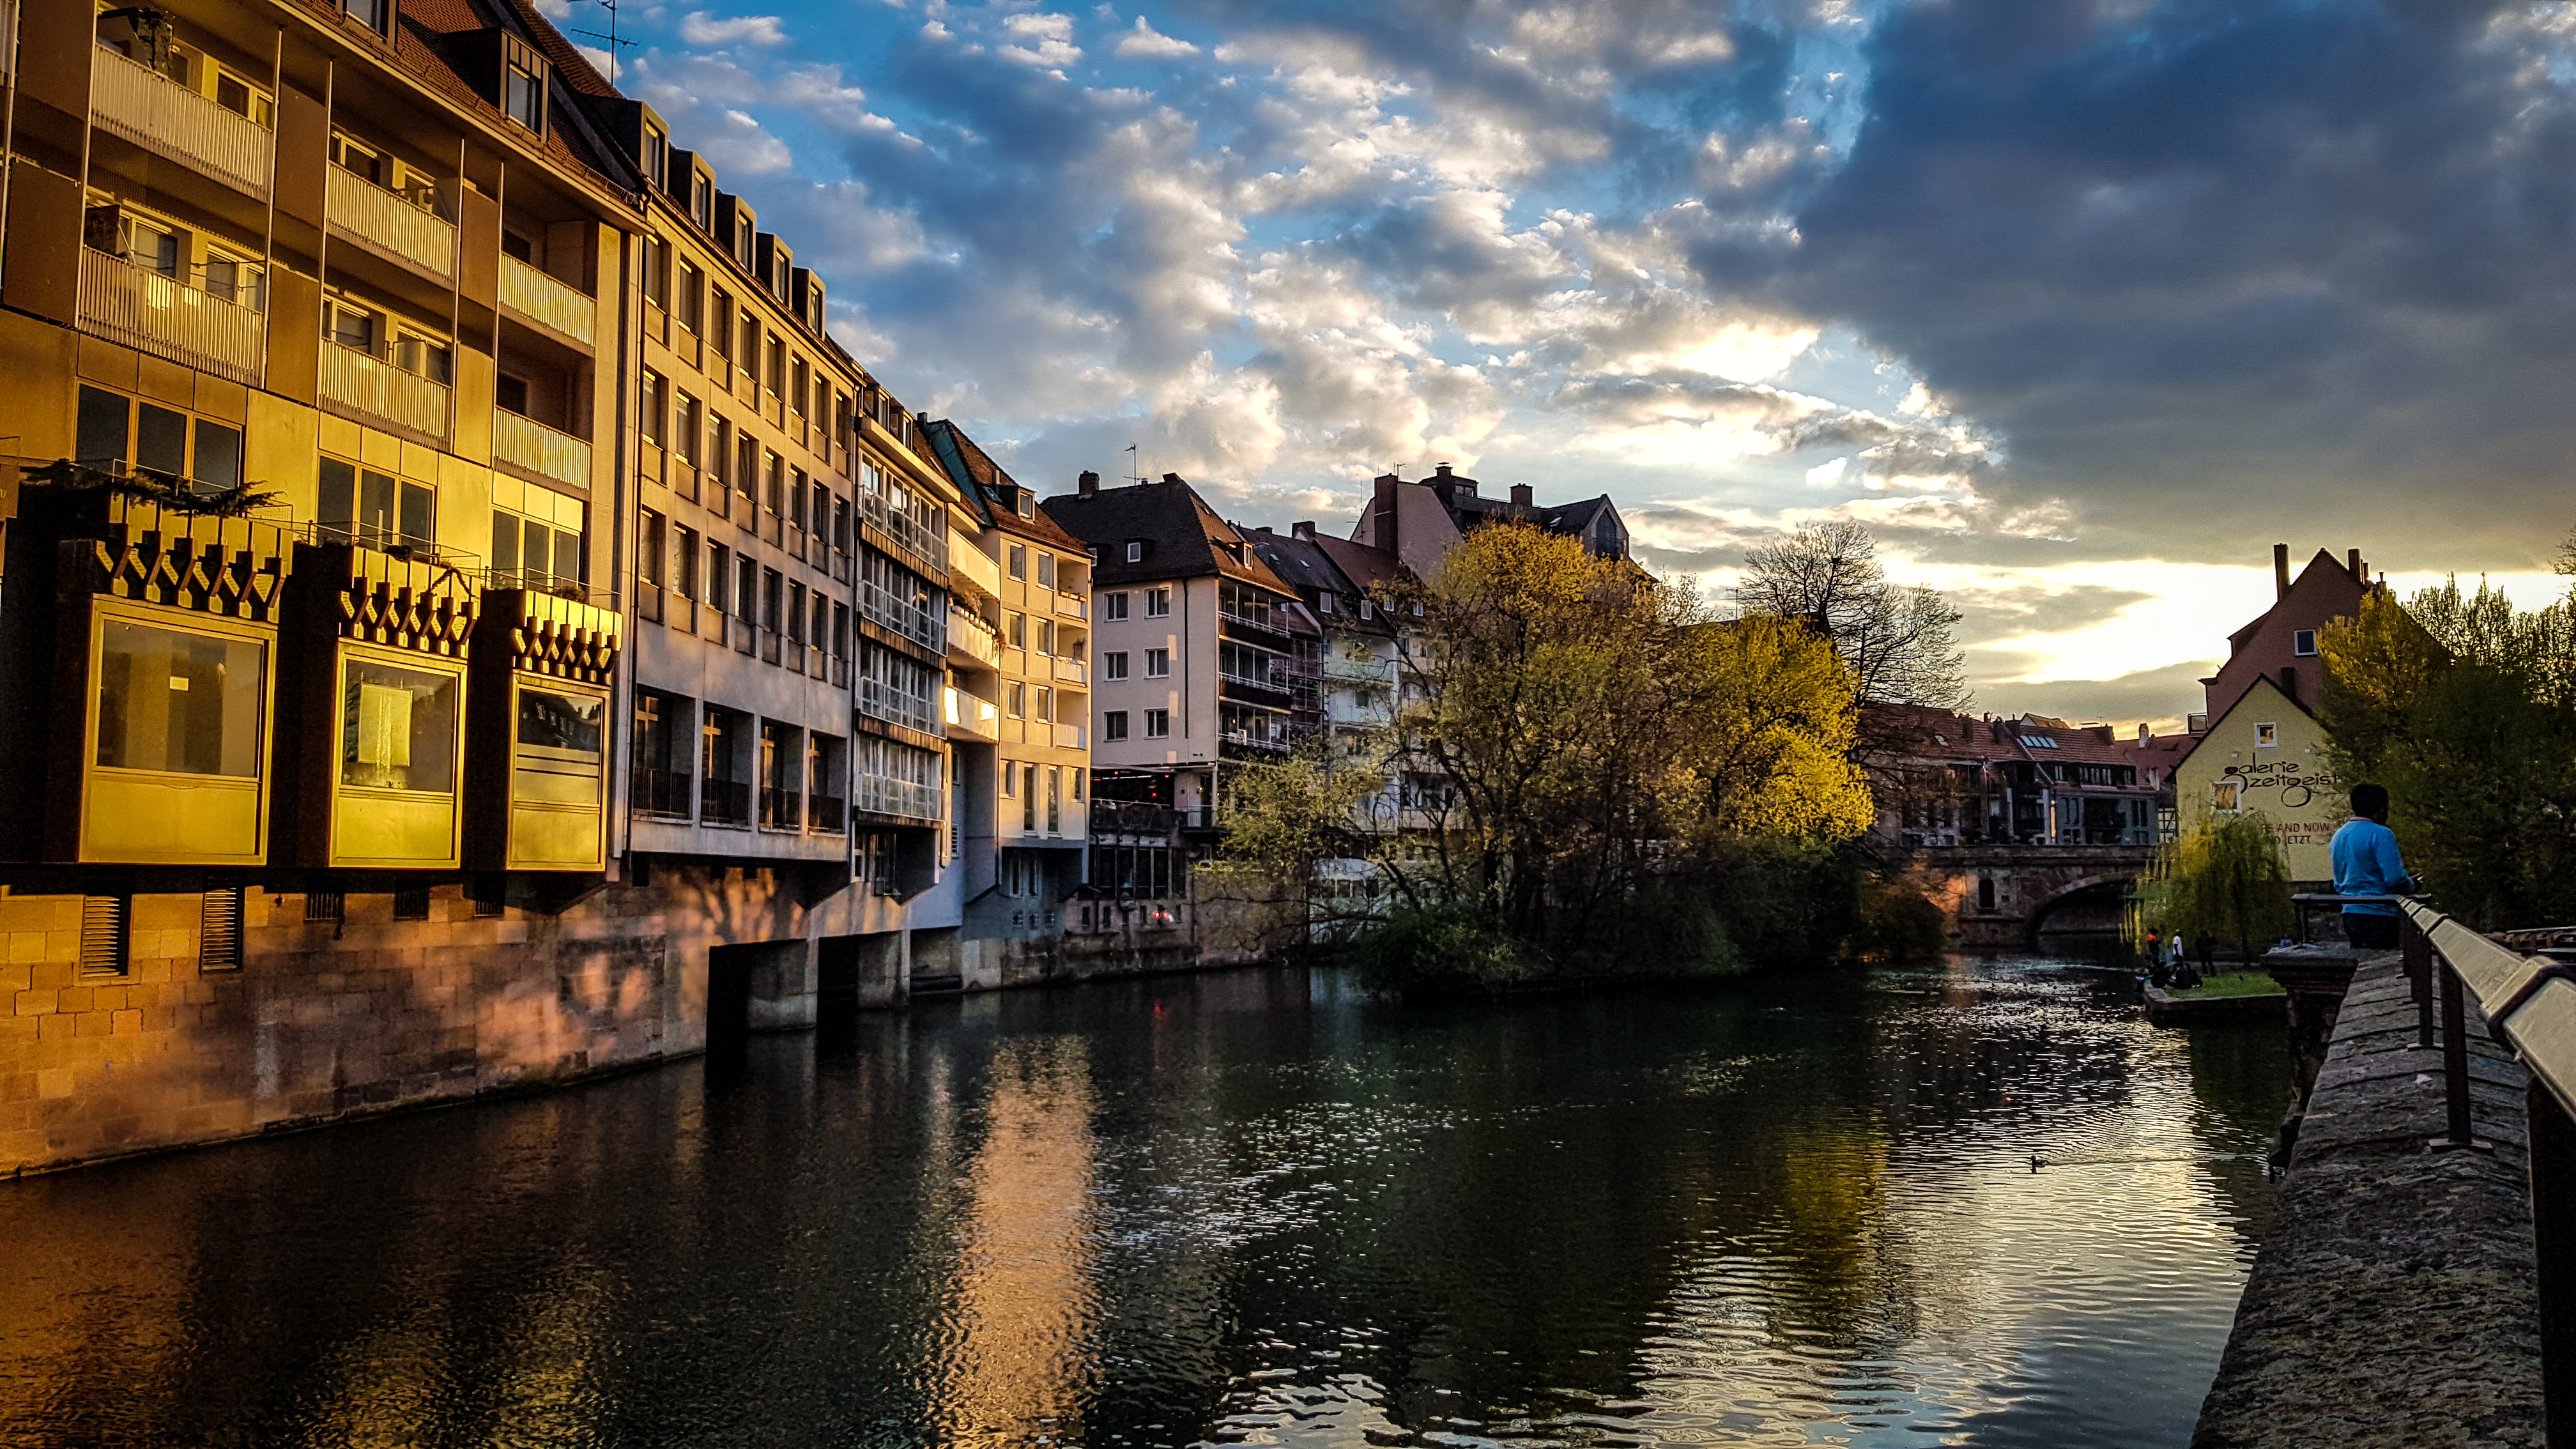 Pegnitz, Nuremberg